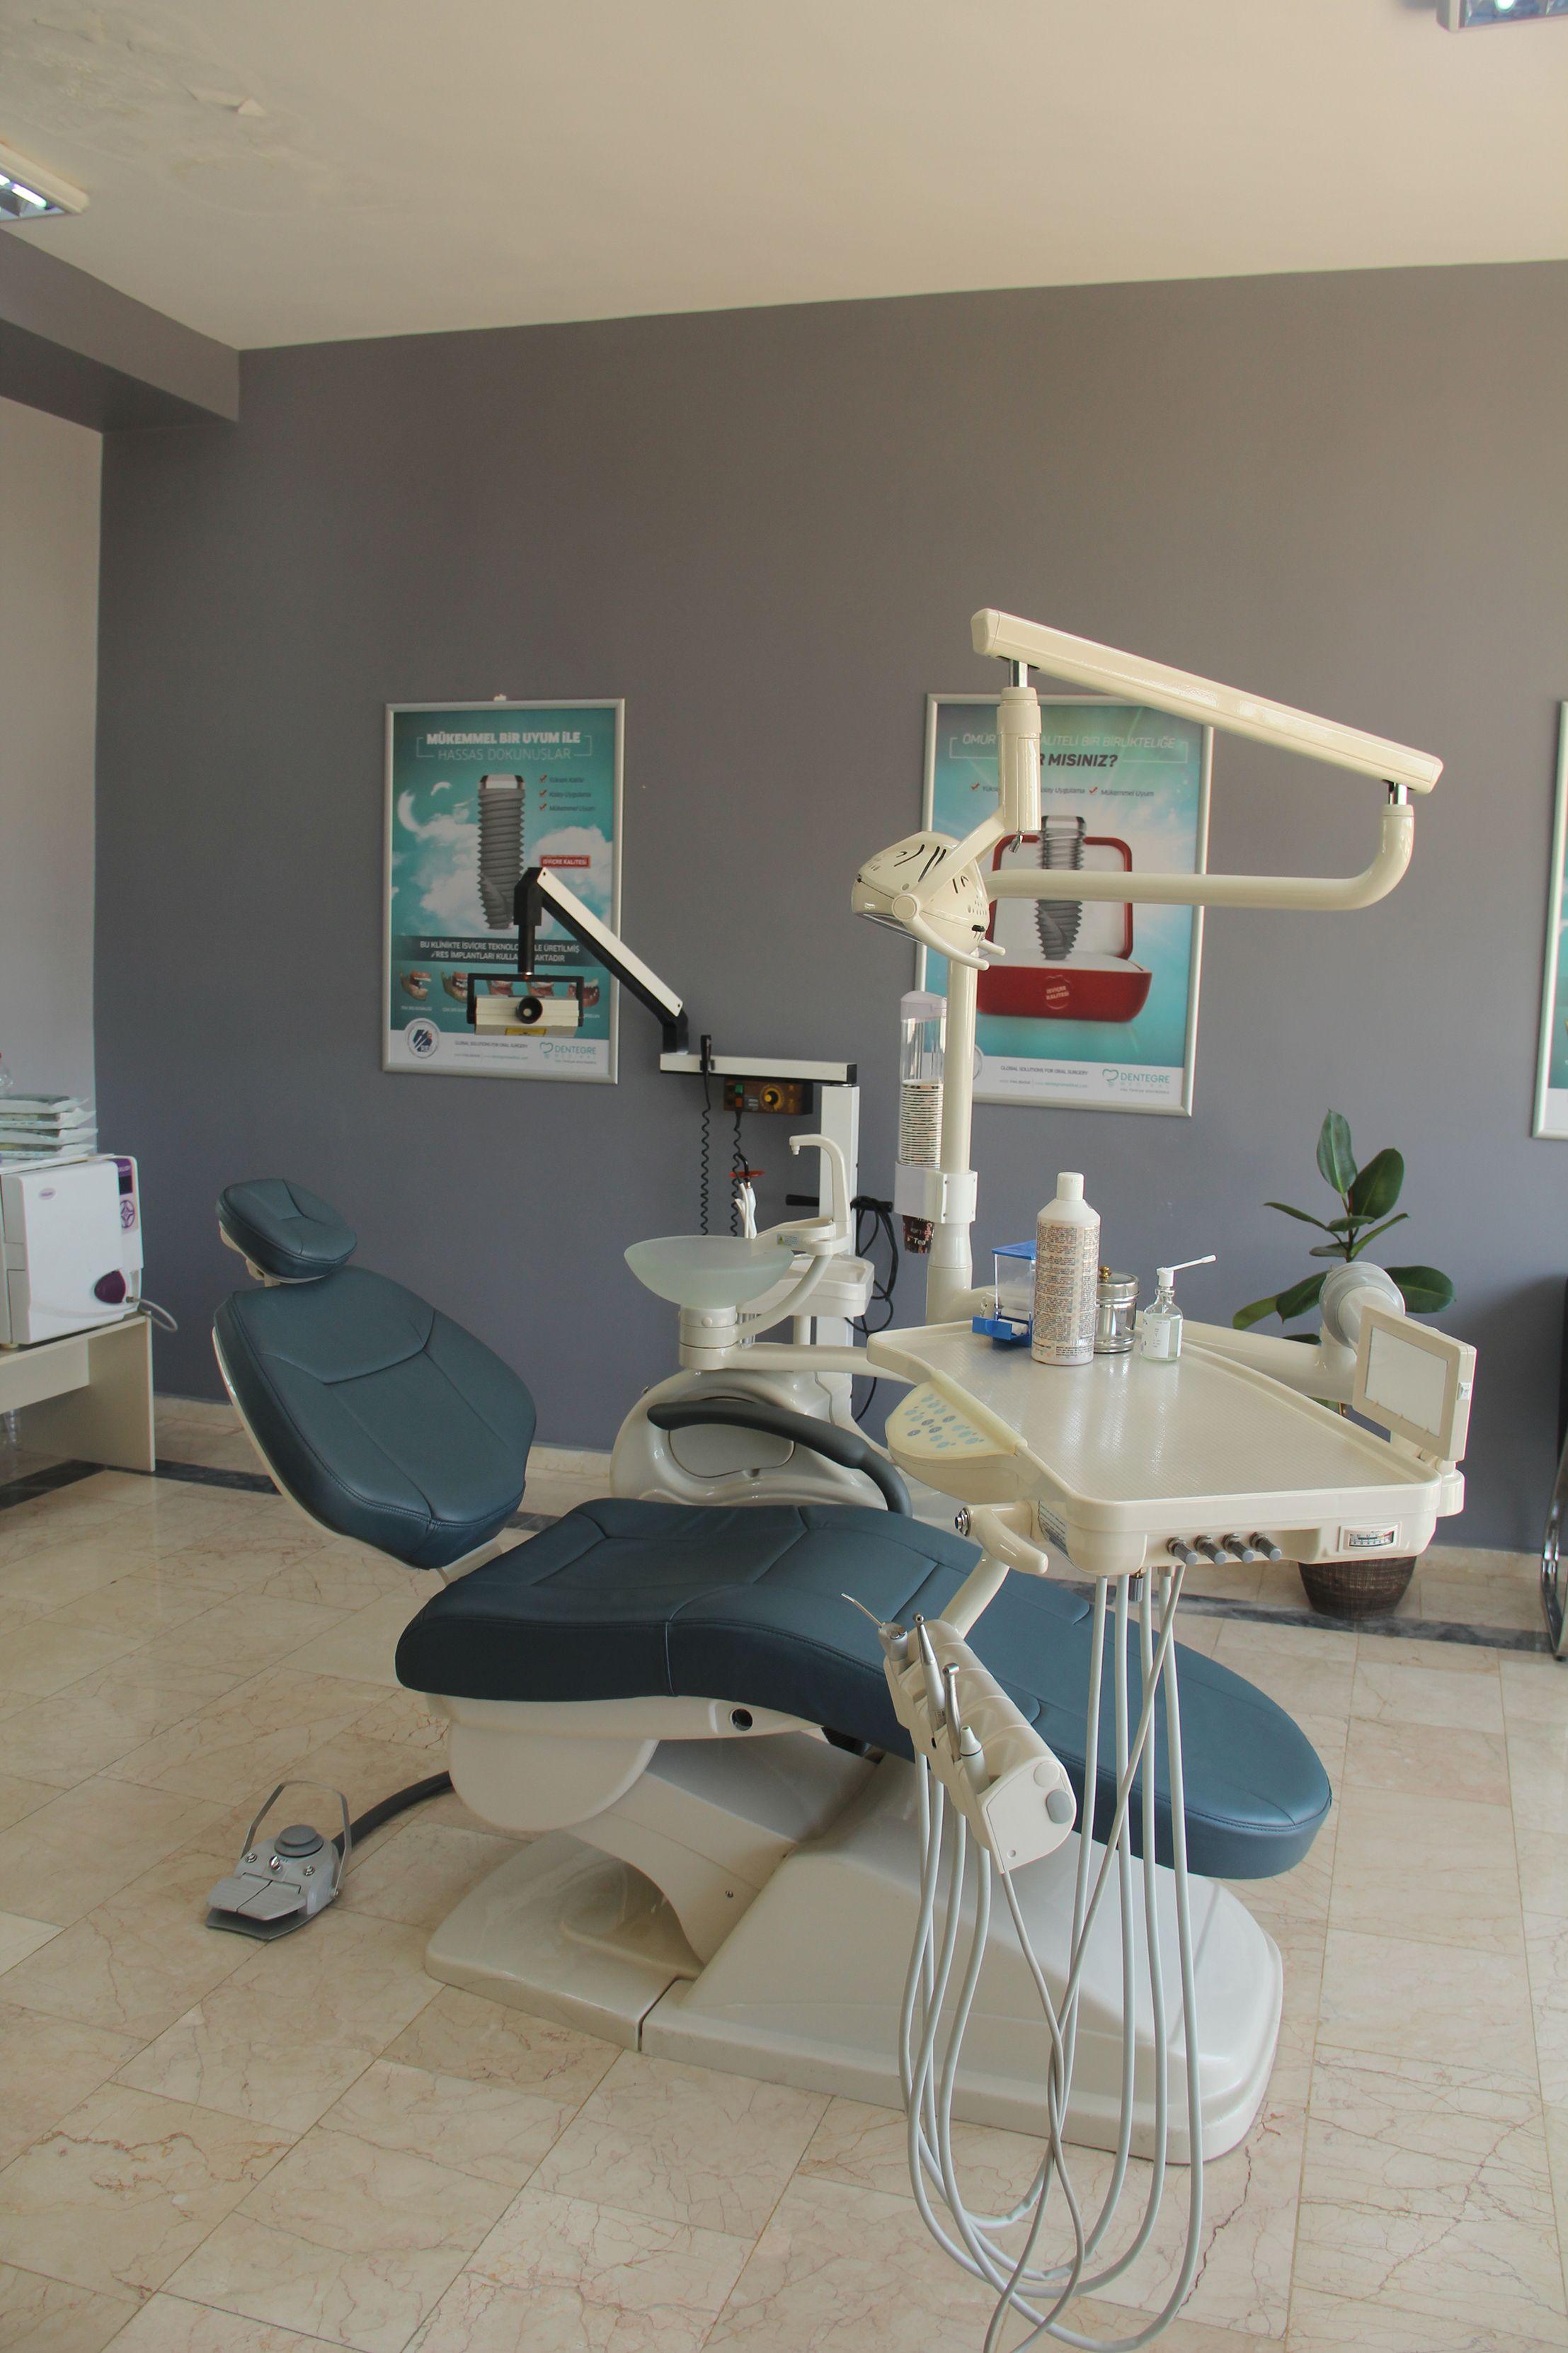 Olgun Baser Dental Care